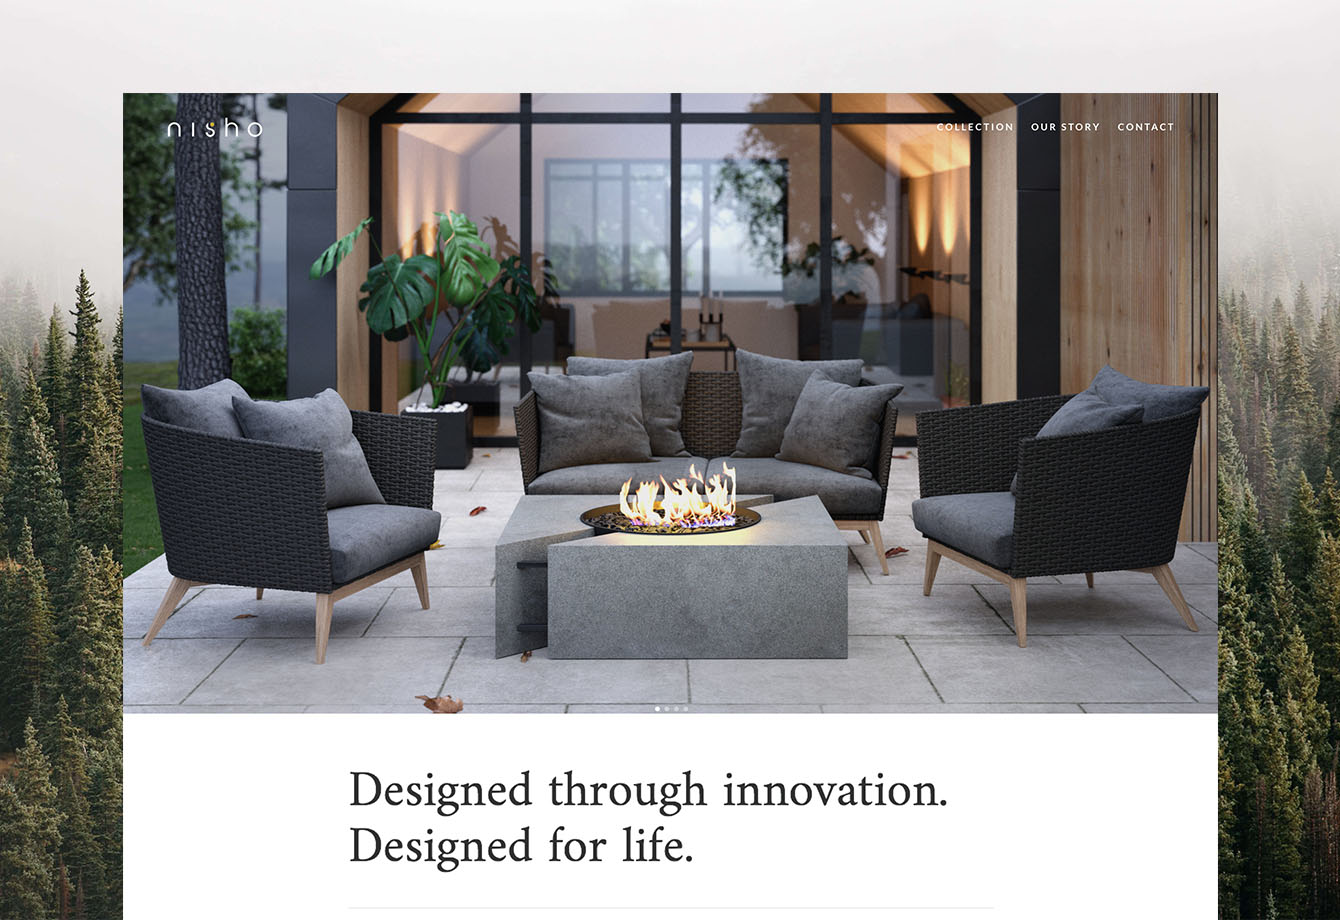 Humdinger_Nisho_innovative 3d design